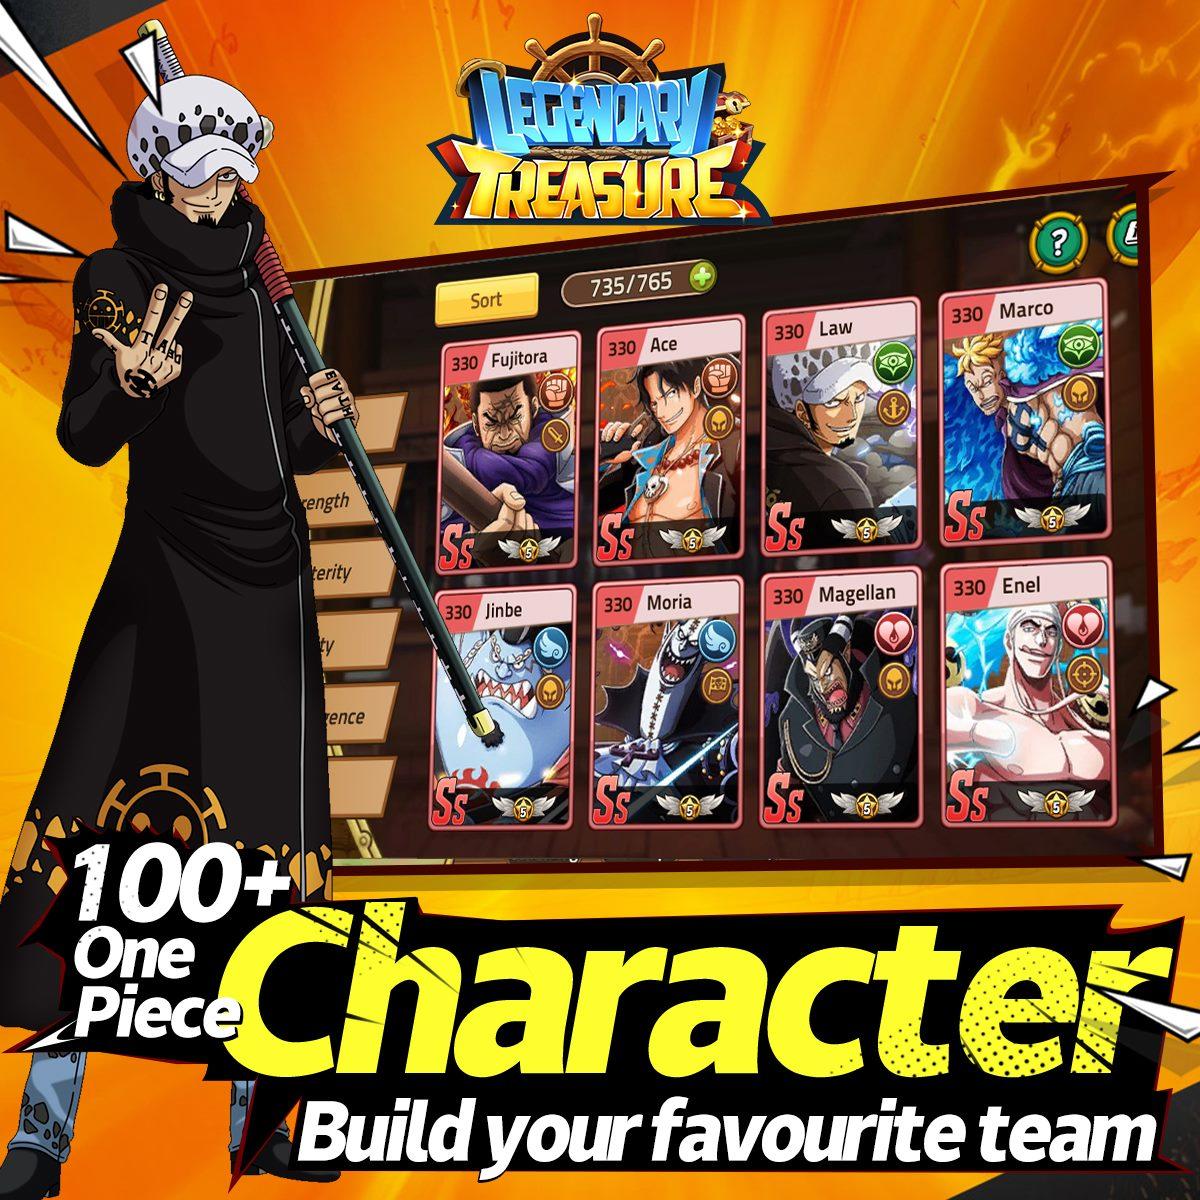 One Piece Legendary Treasure 622021 3